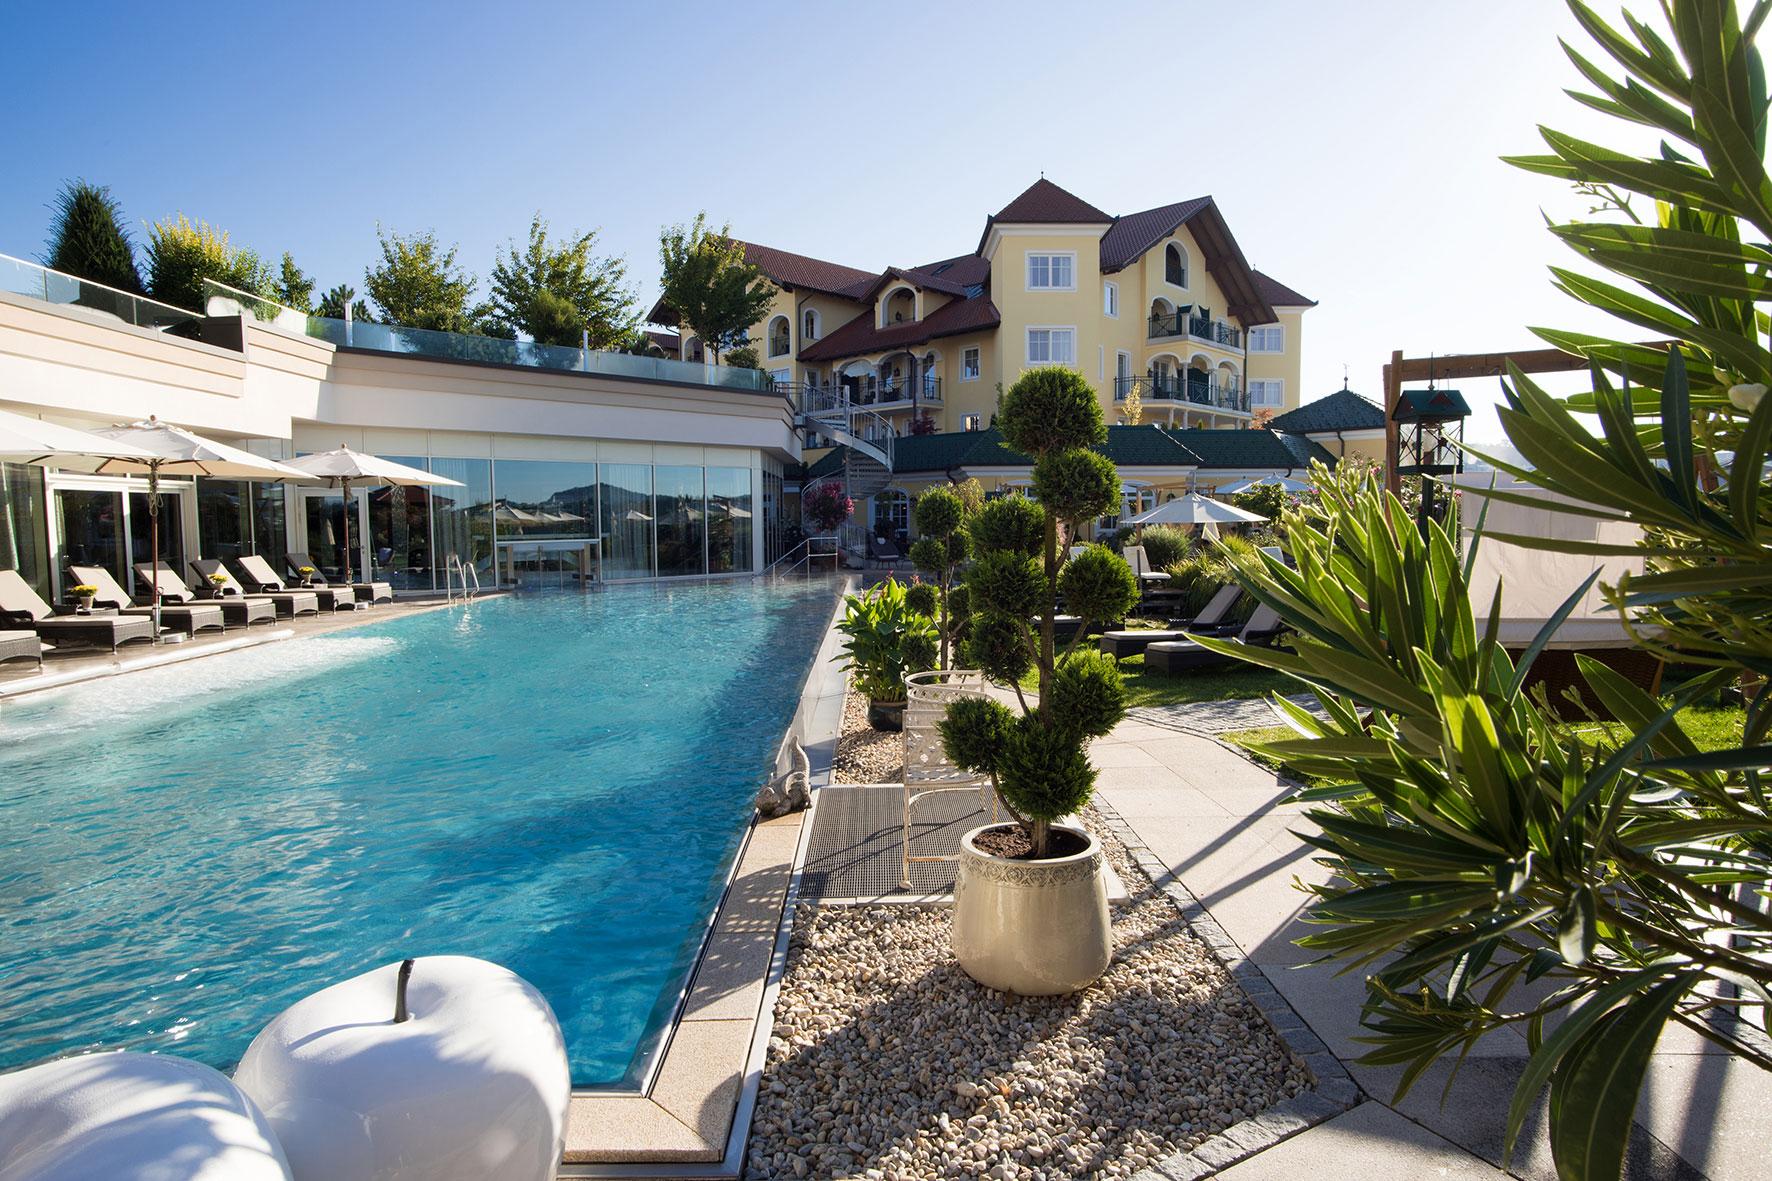 Erstes 5 Sterne Hotel Im Bayerischer Wald First Class Wellness